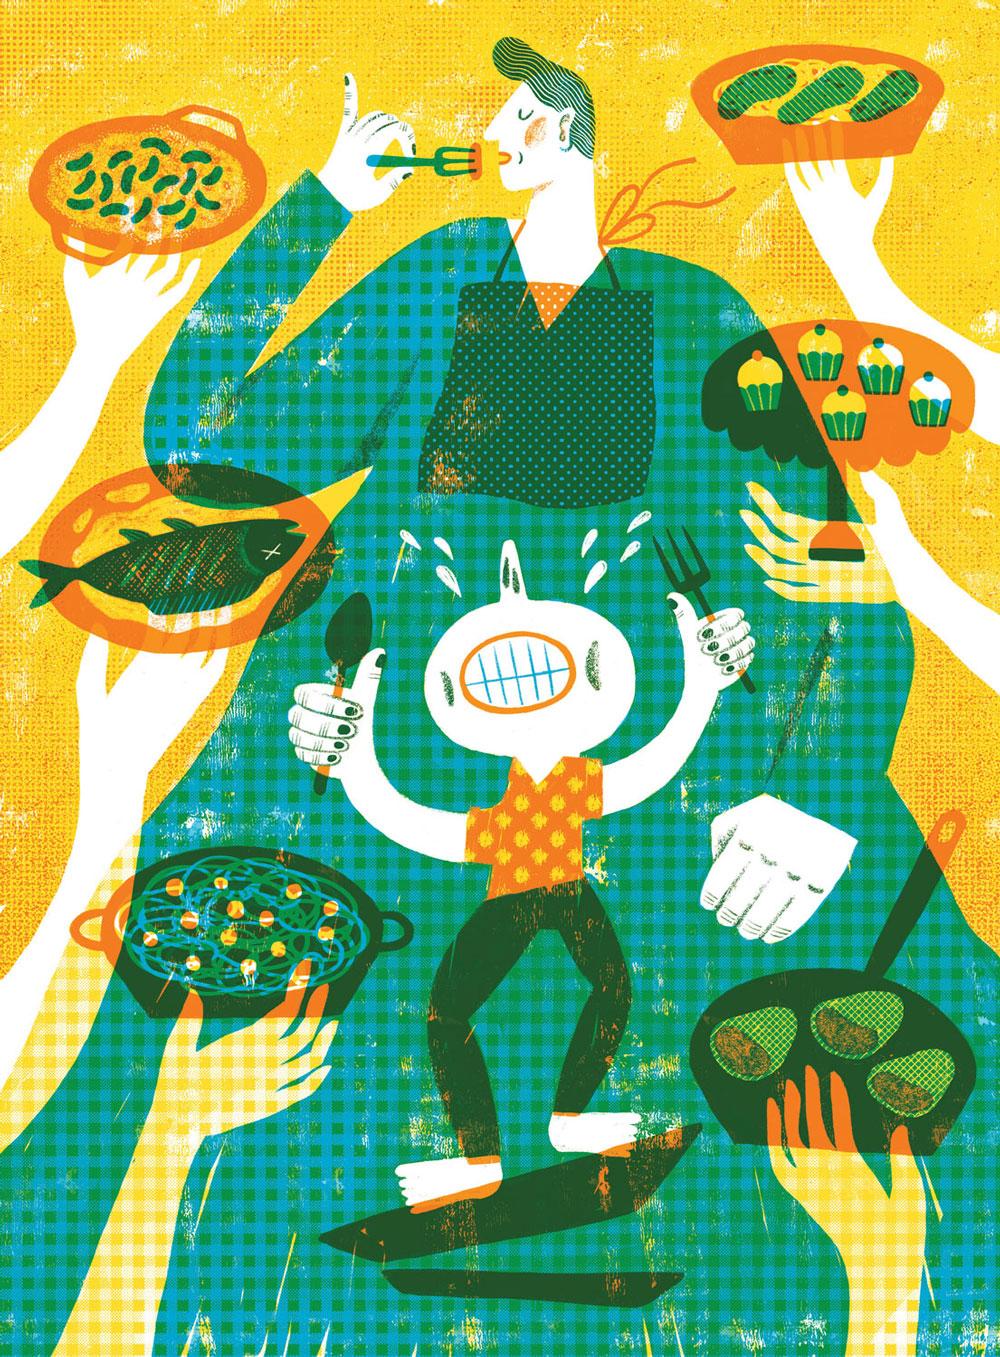 danjungchoi_illustration.jpg